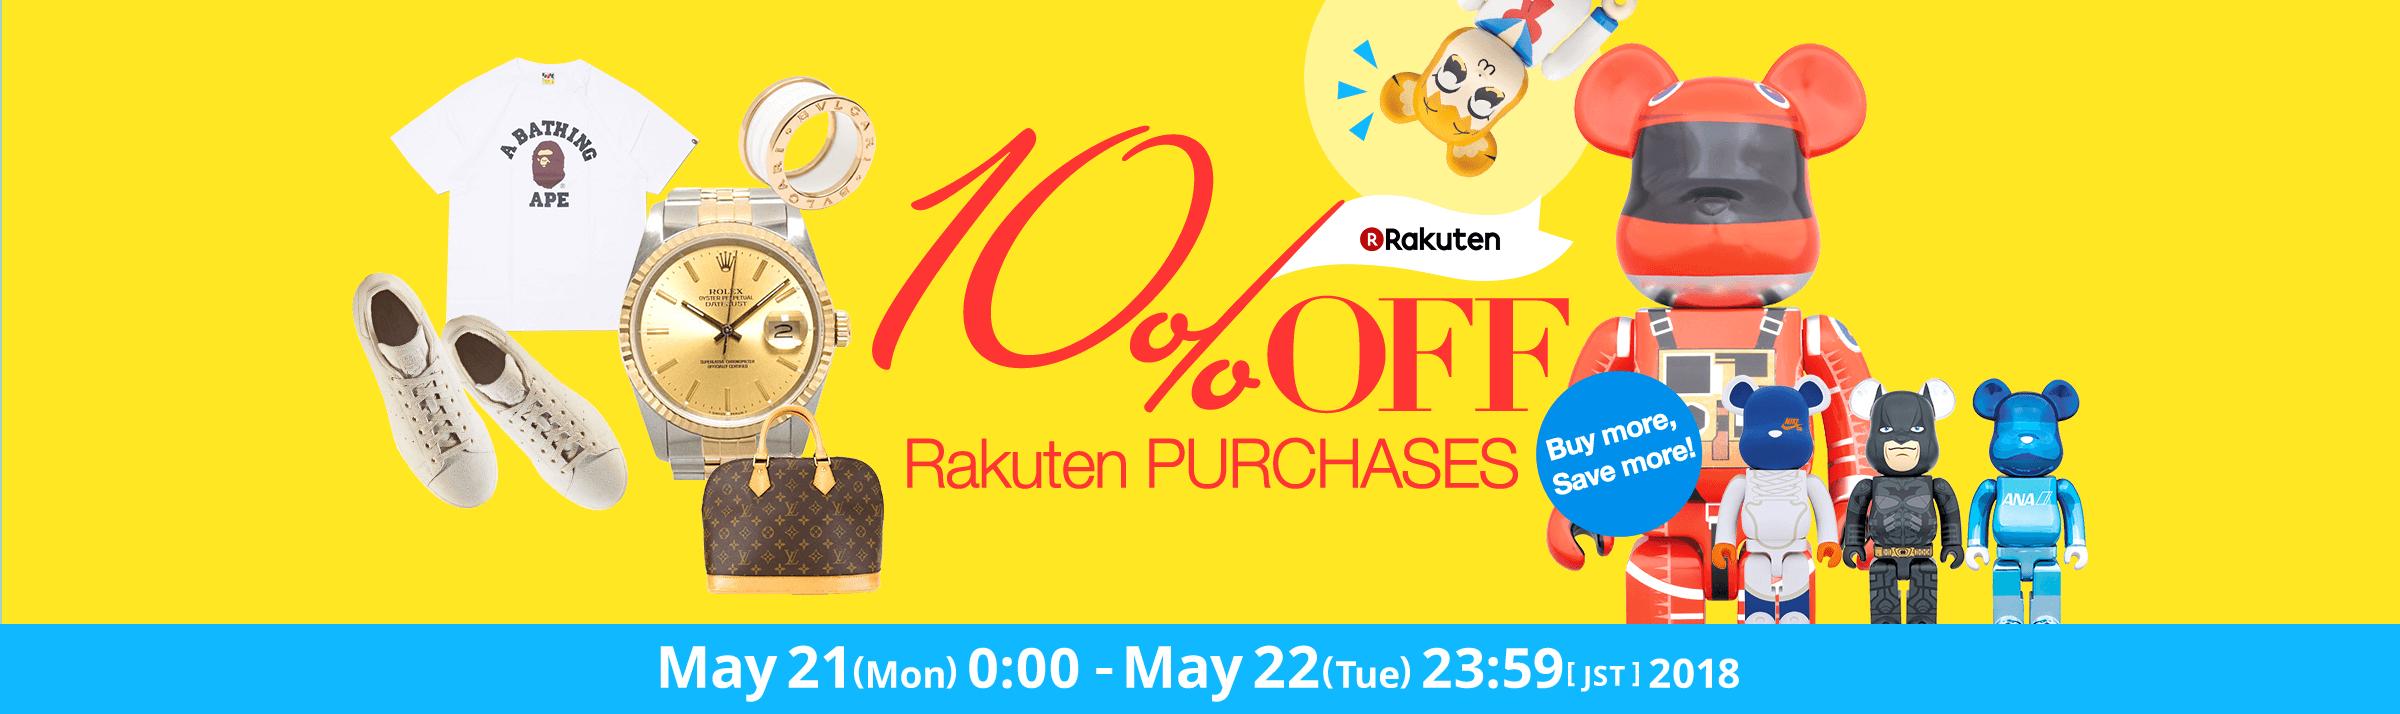 Earn 10% Cash Back on Rakuten Purchases